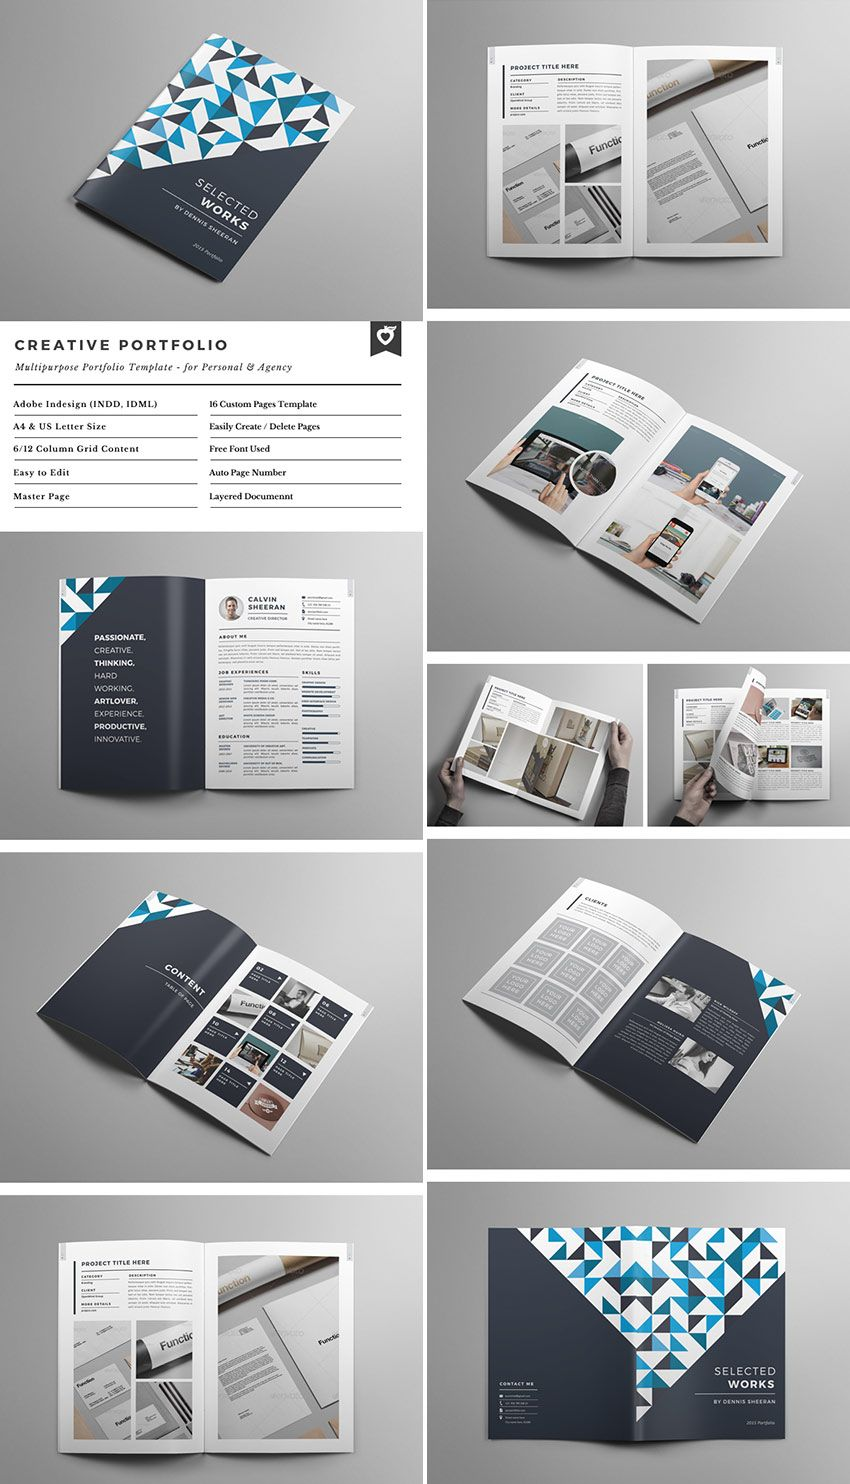 Creative Portfolio Brochure INDD | Resumes and Portfolio | Pinterest ...